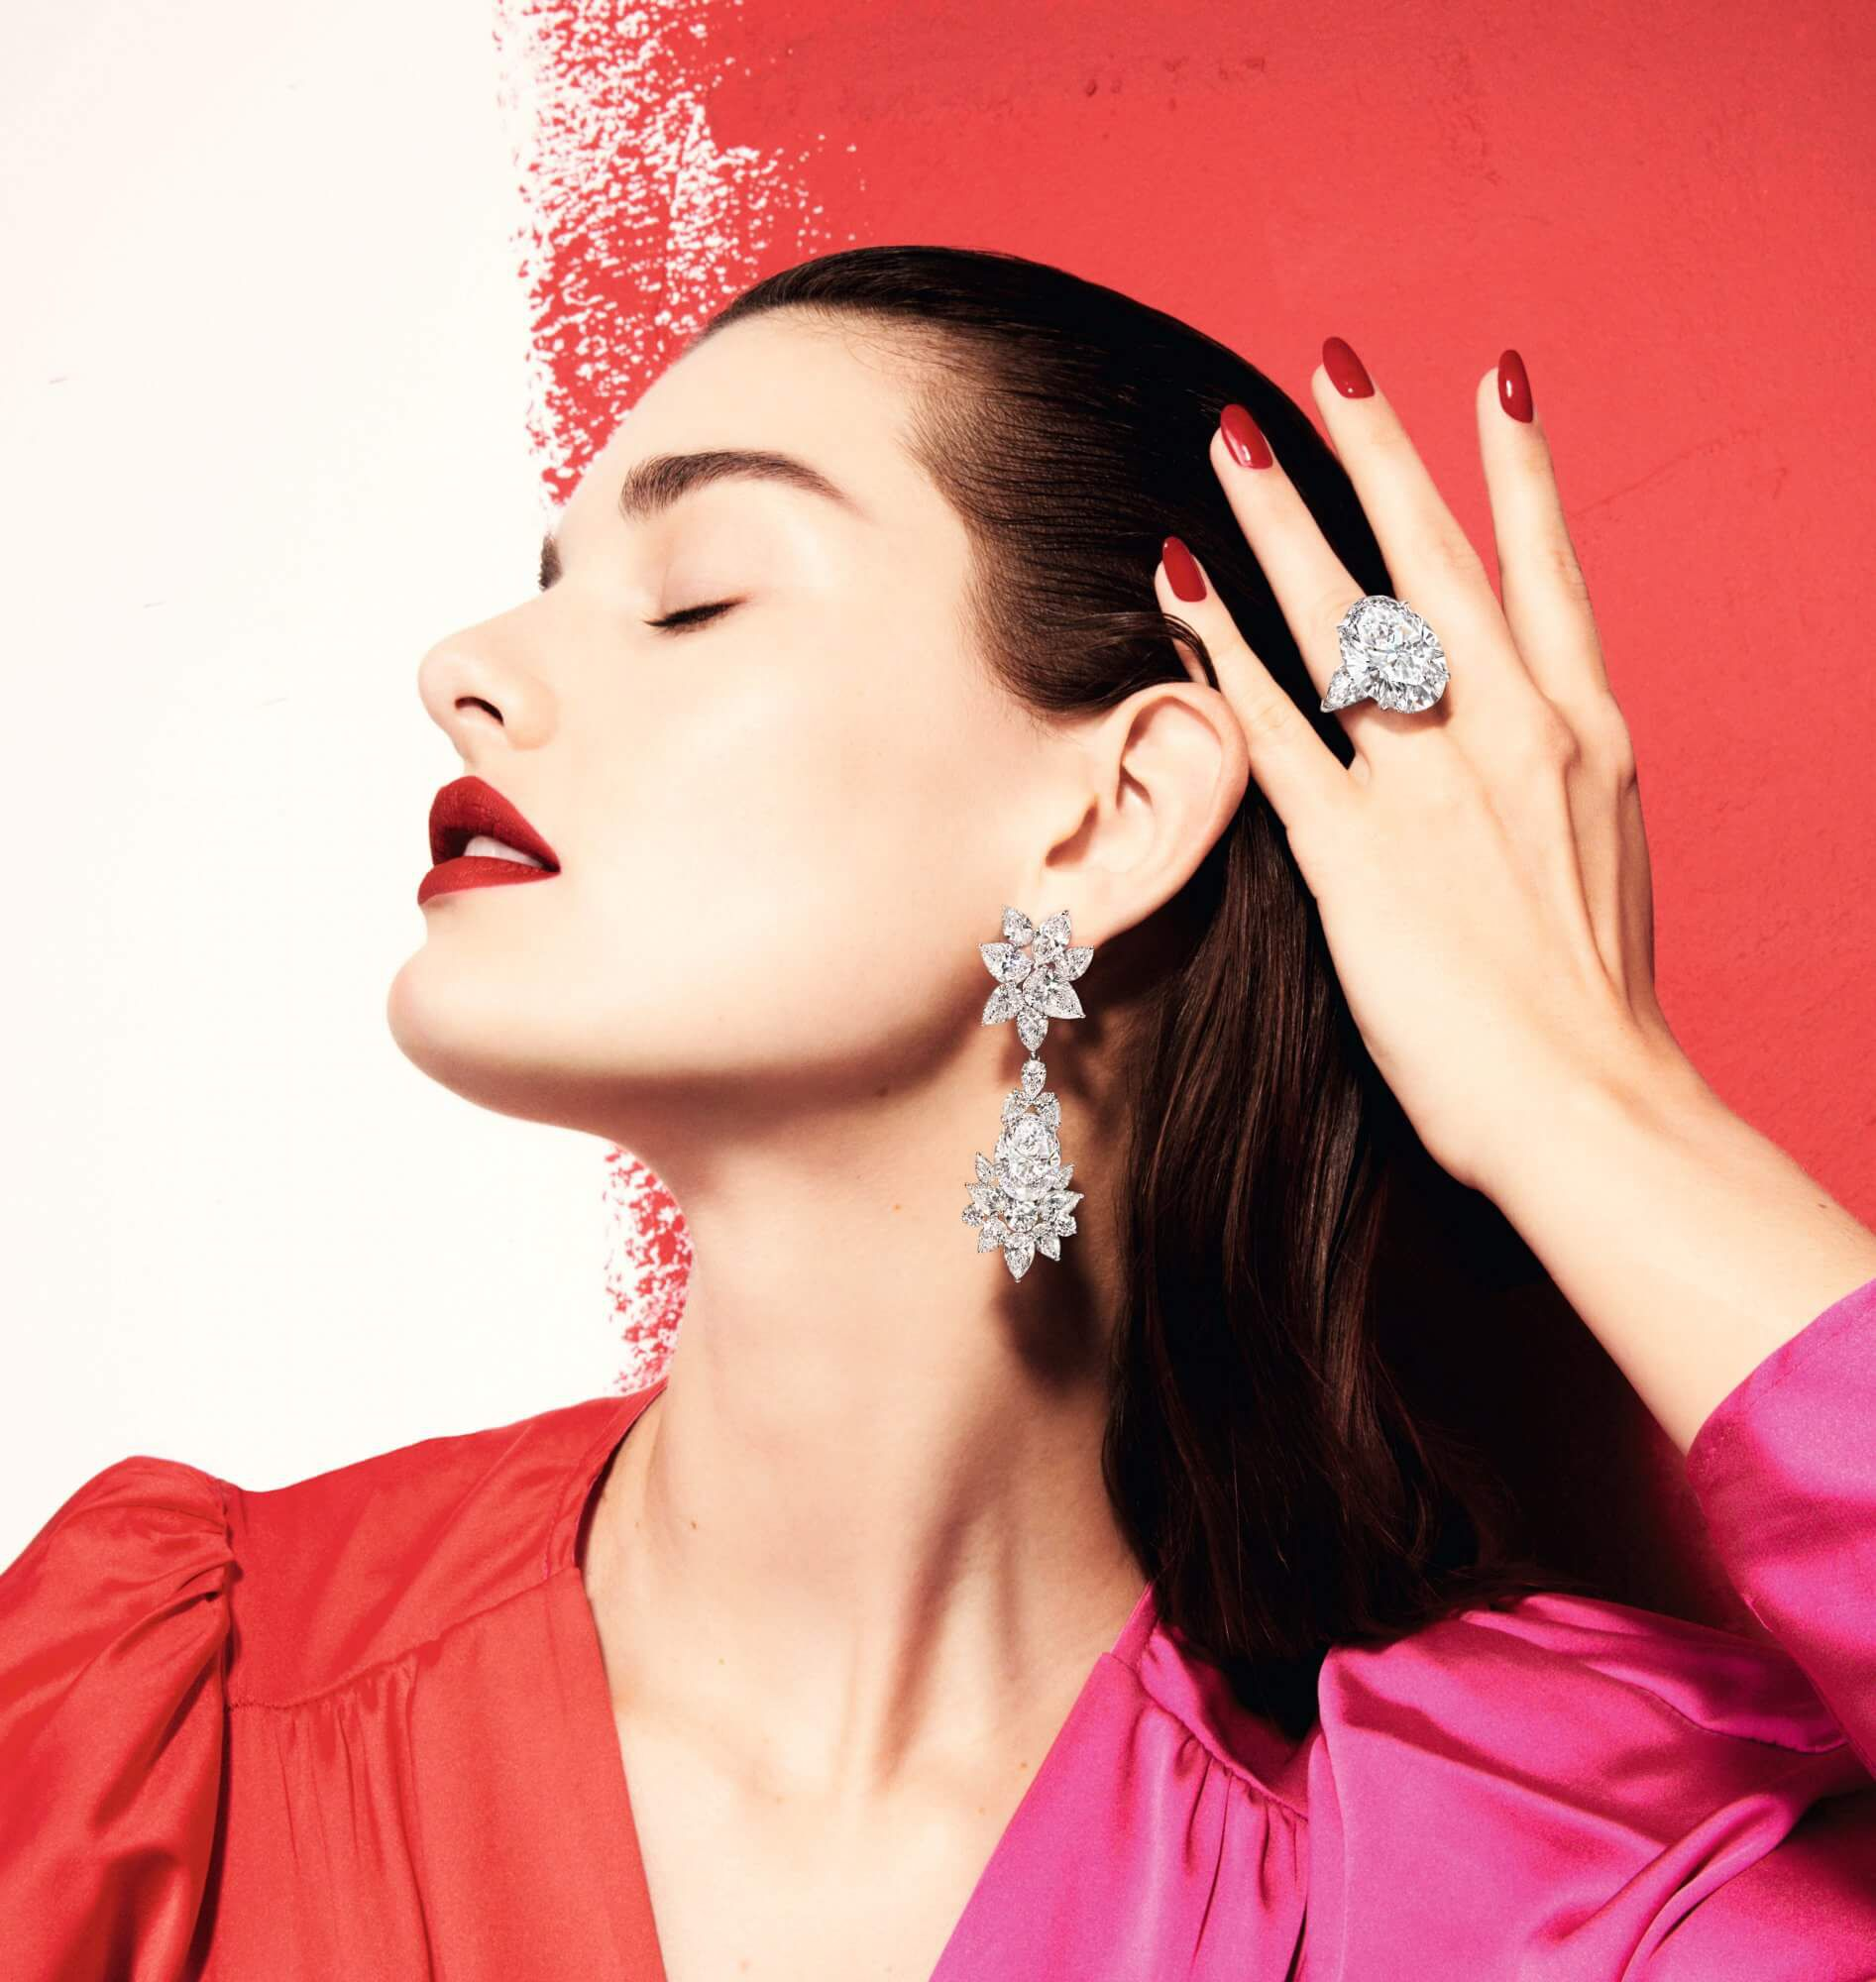 Model wears Graff white diamond high jewellery earrings and ring